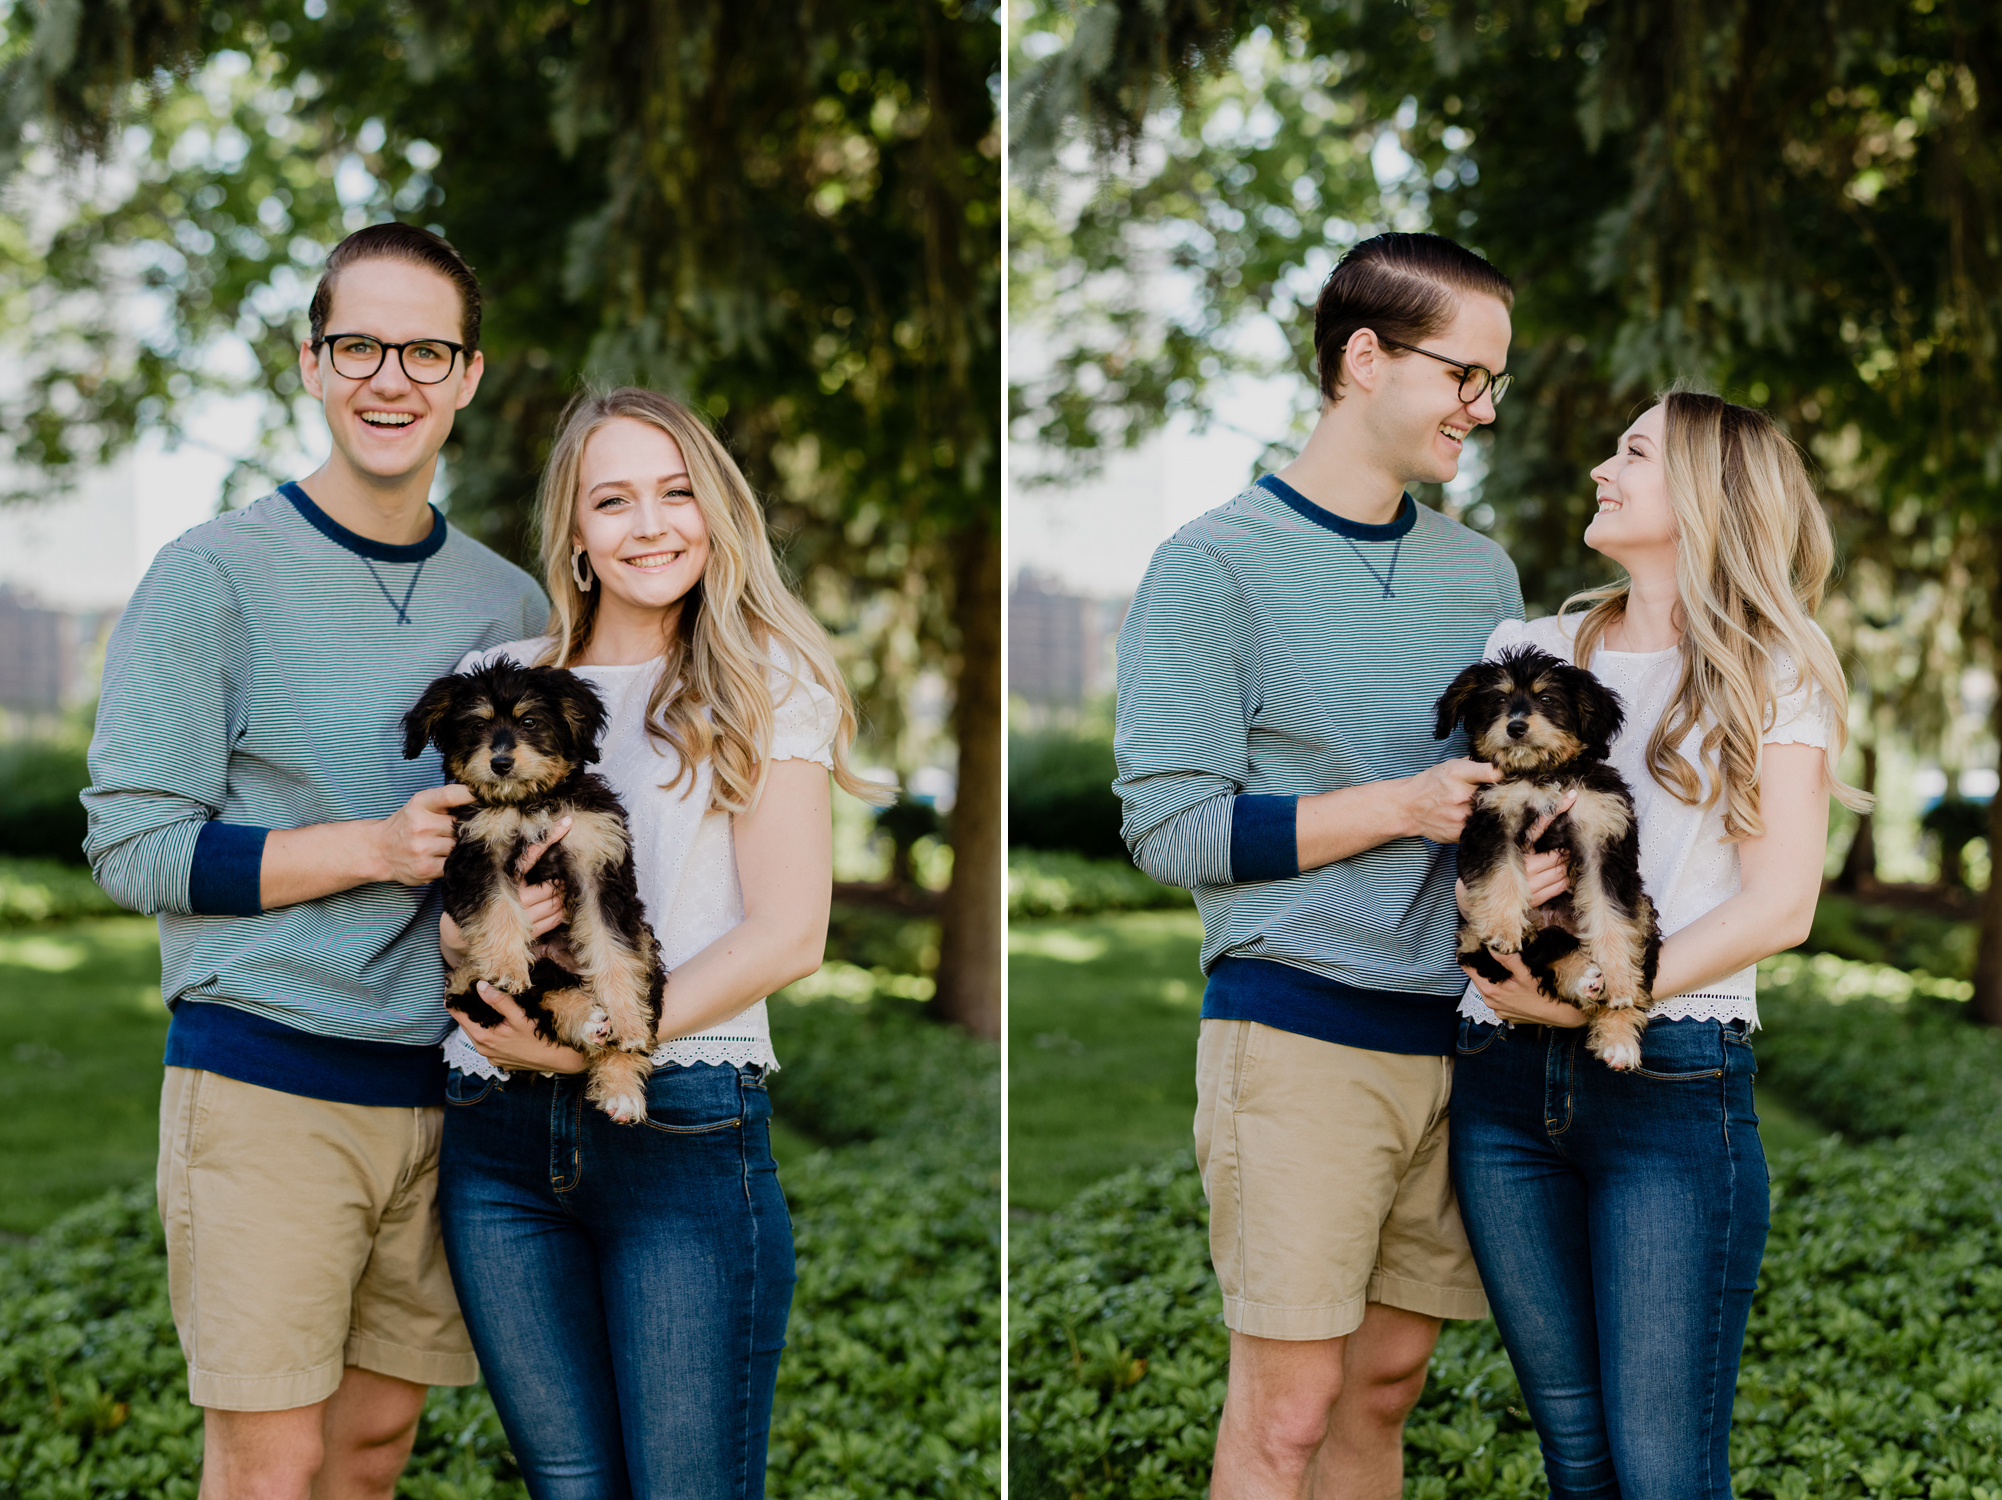 grand-rapids-michigan-engagement-with-dog (2).jpg